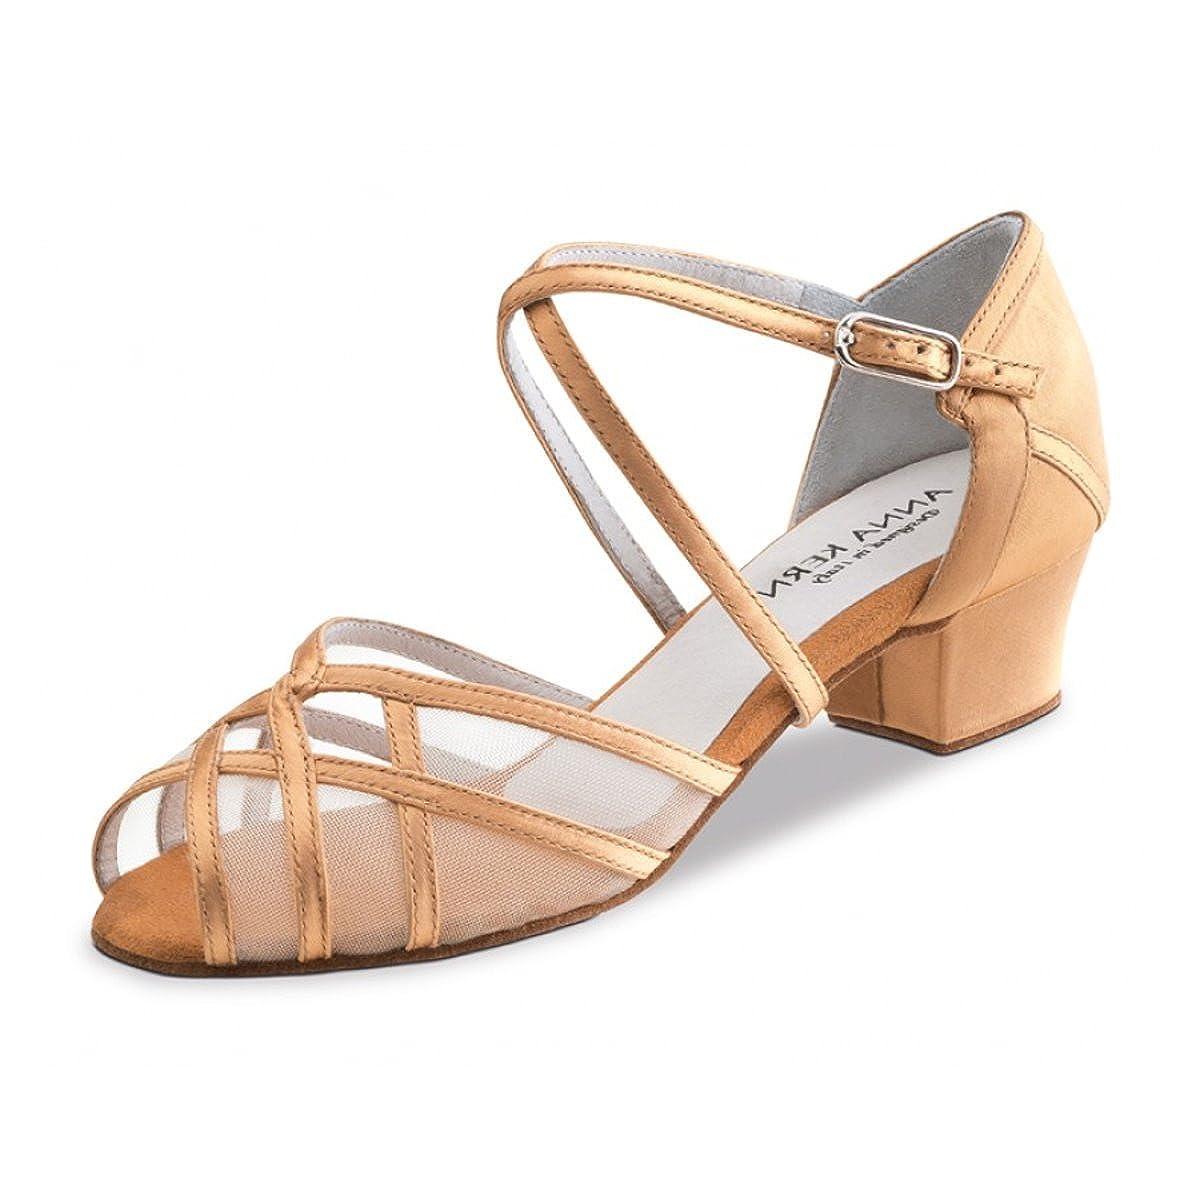 Anna Kern - Damen Damen Damen Tanzschuhe 520-35 - Satin Bronze - 3,5 cm B06ZZLDXSJ Tanzschuhe Modernes Design 8ff9a1